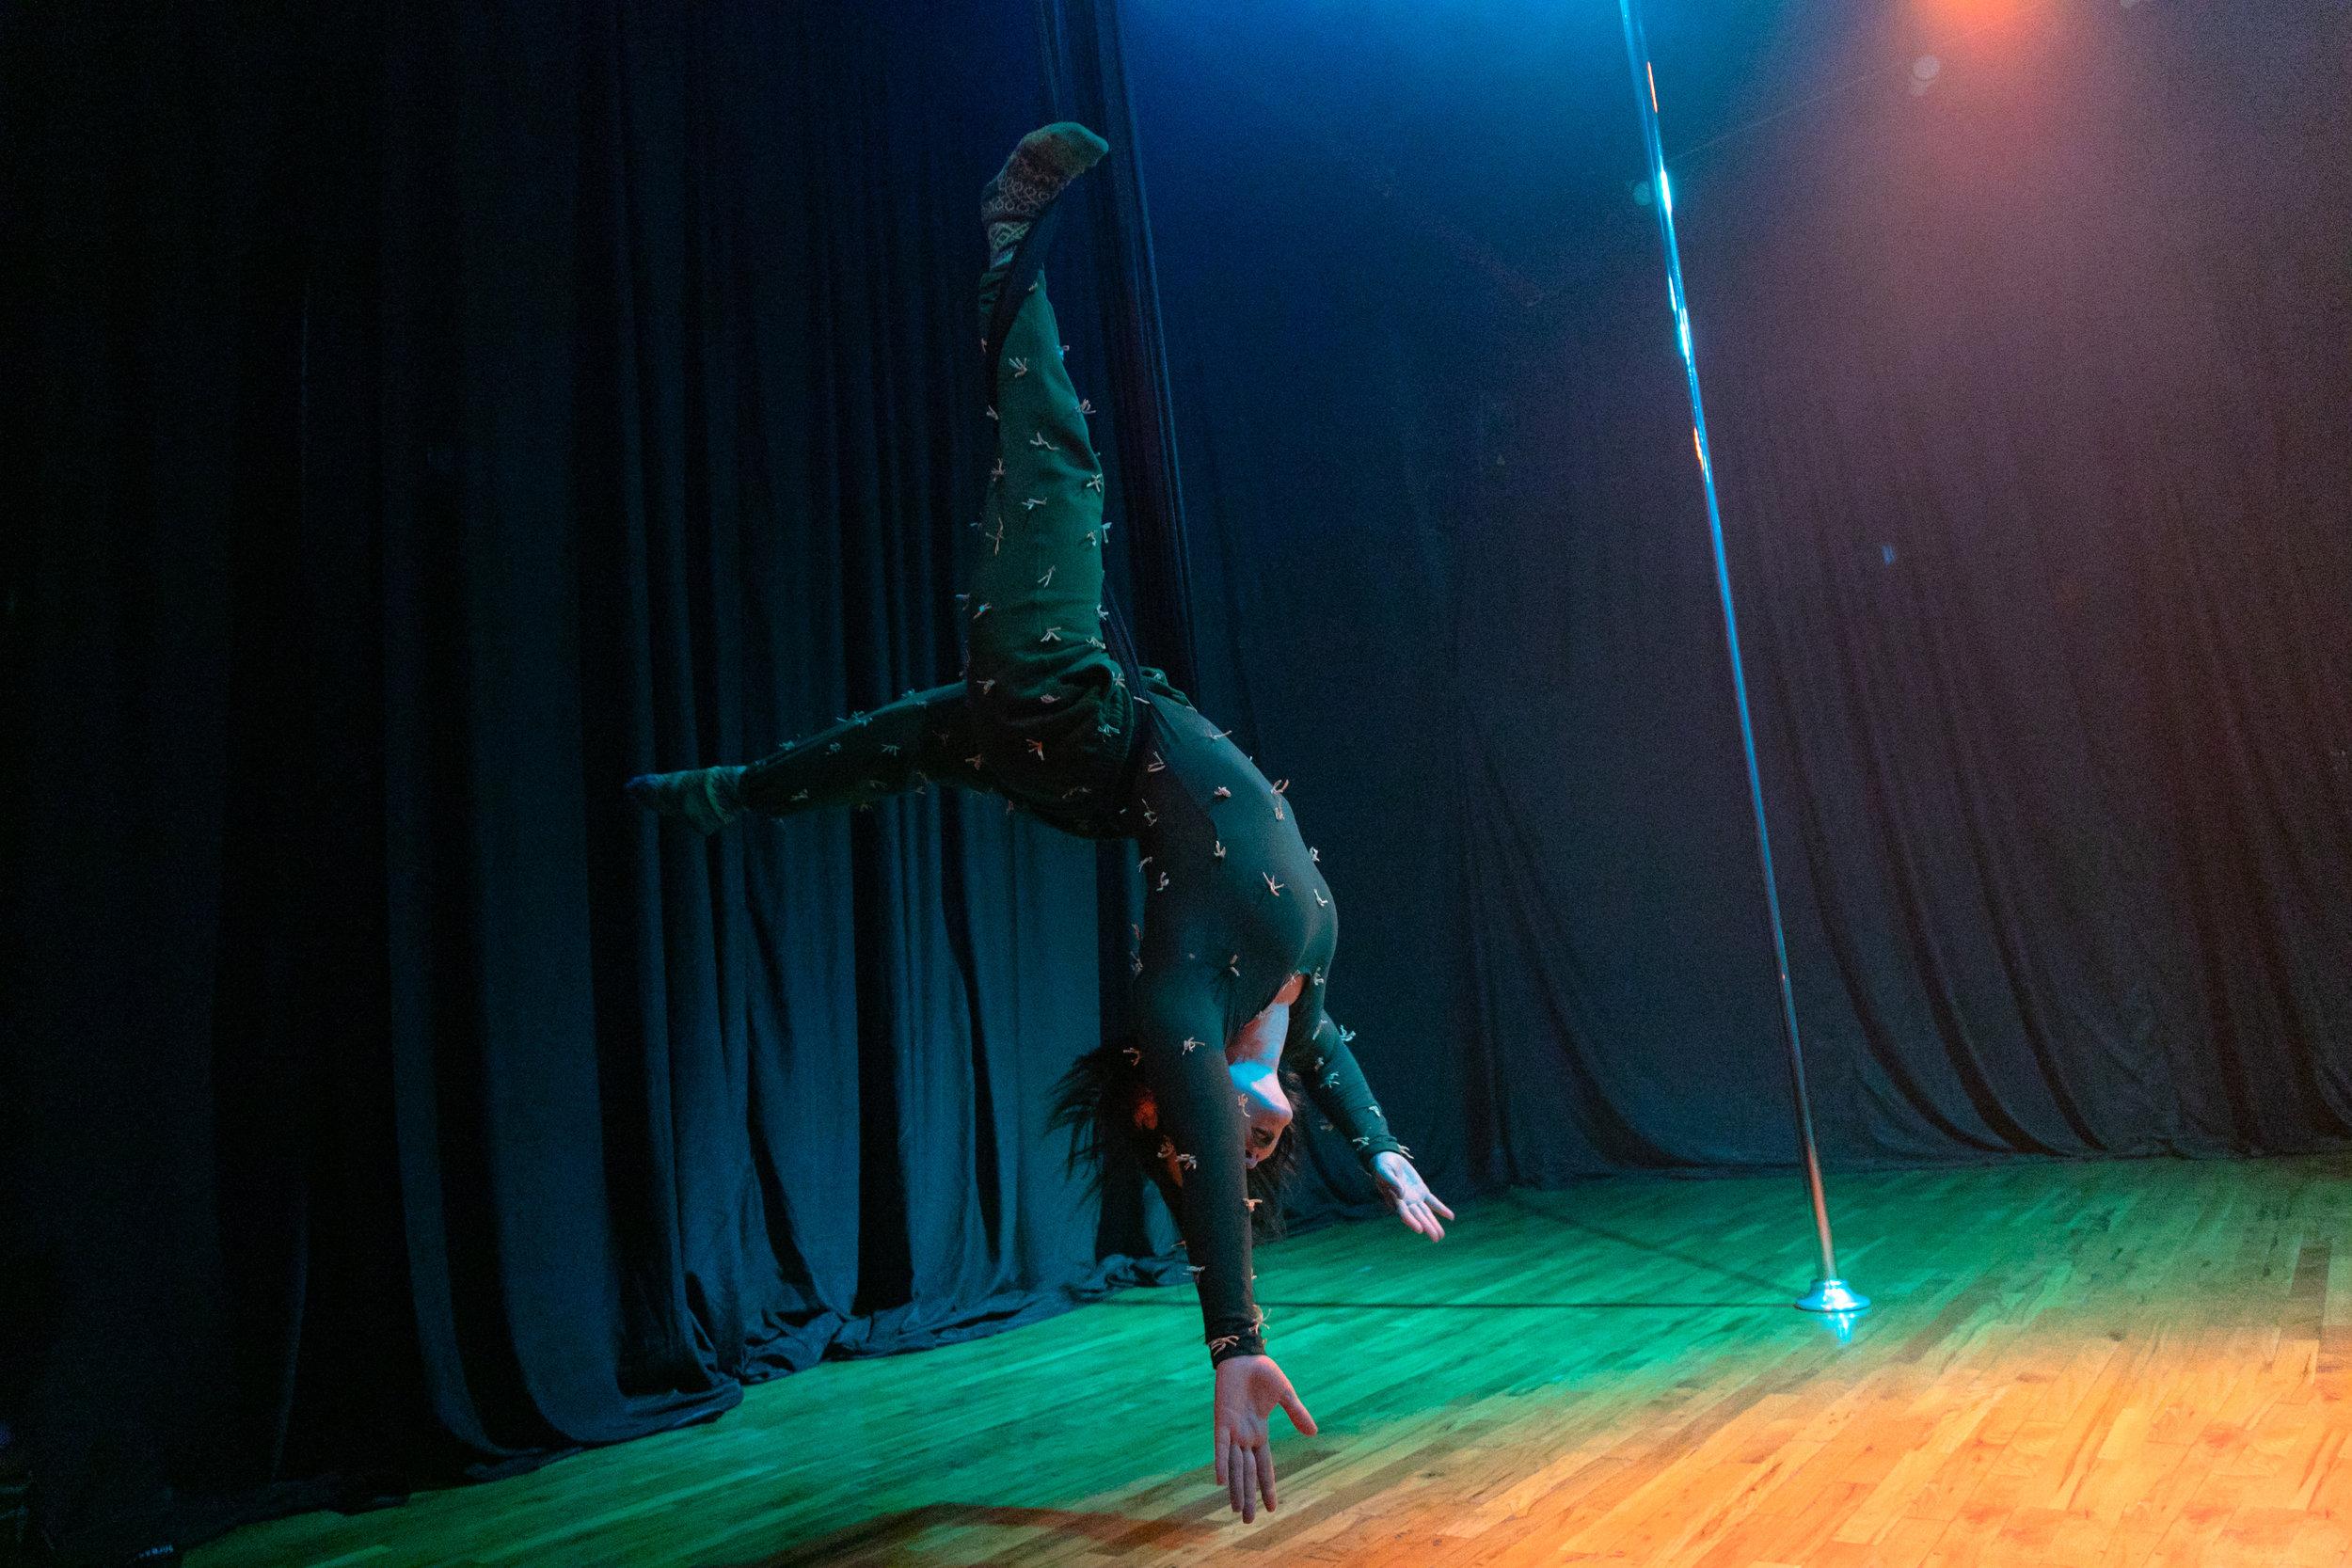 Wild Wild West: Body & Pole Showcase © Vades Joseph